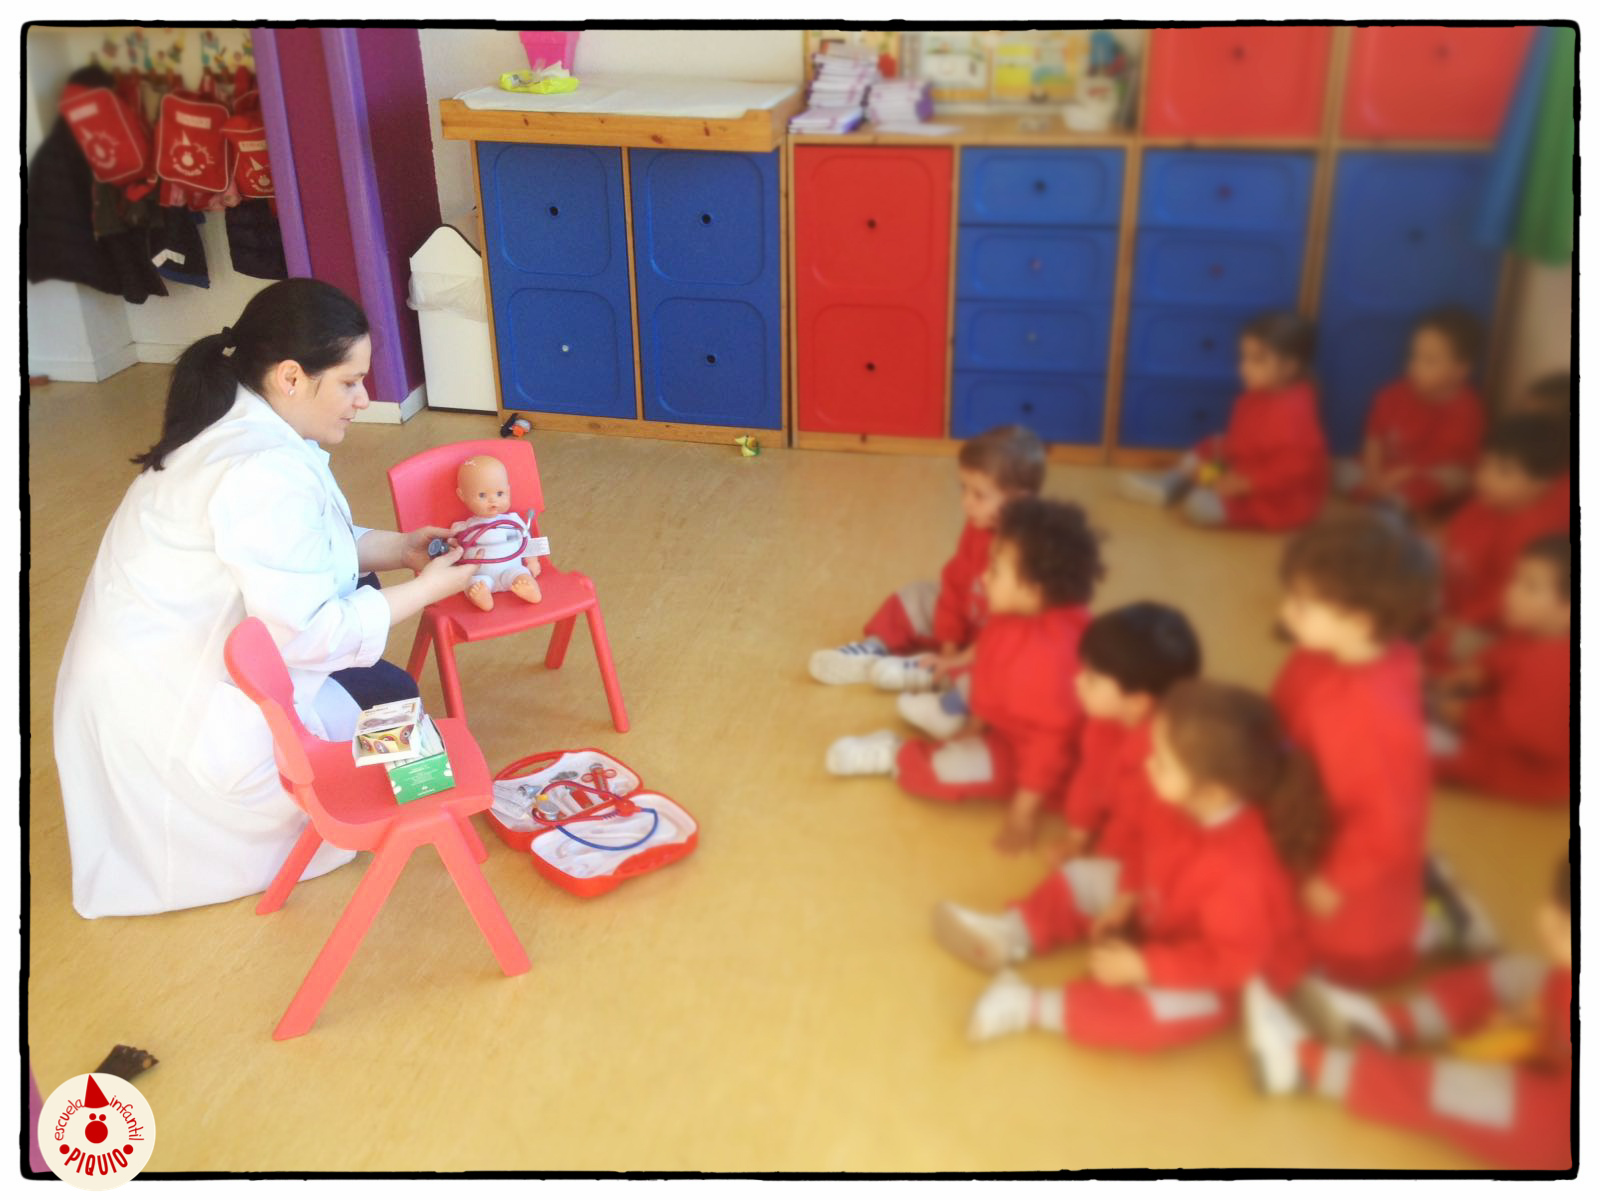 Escuela infantil piquio pozuelo mam pediatra visita - Escuelas infantiles pozuelo ...